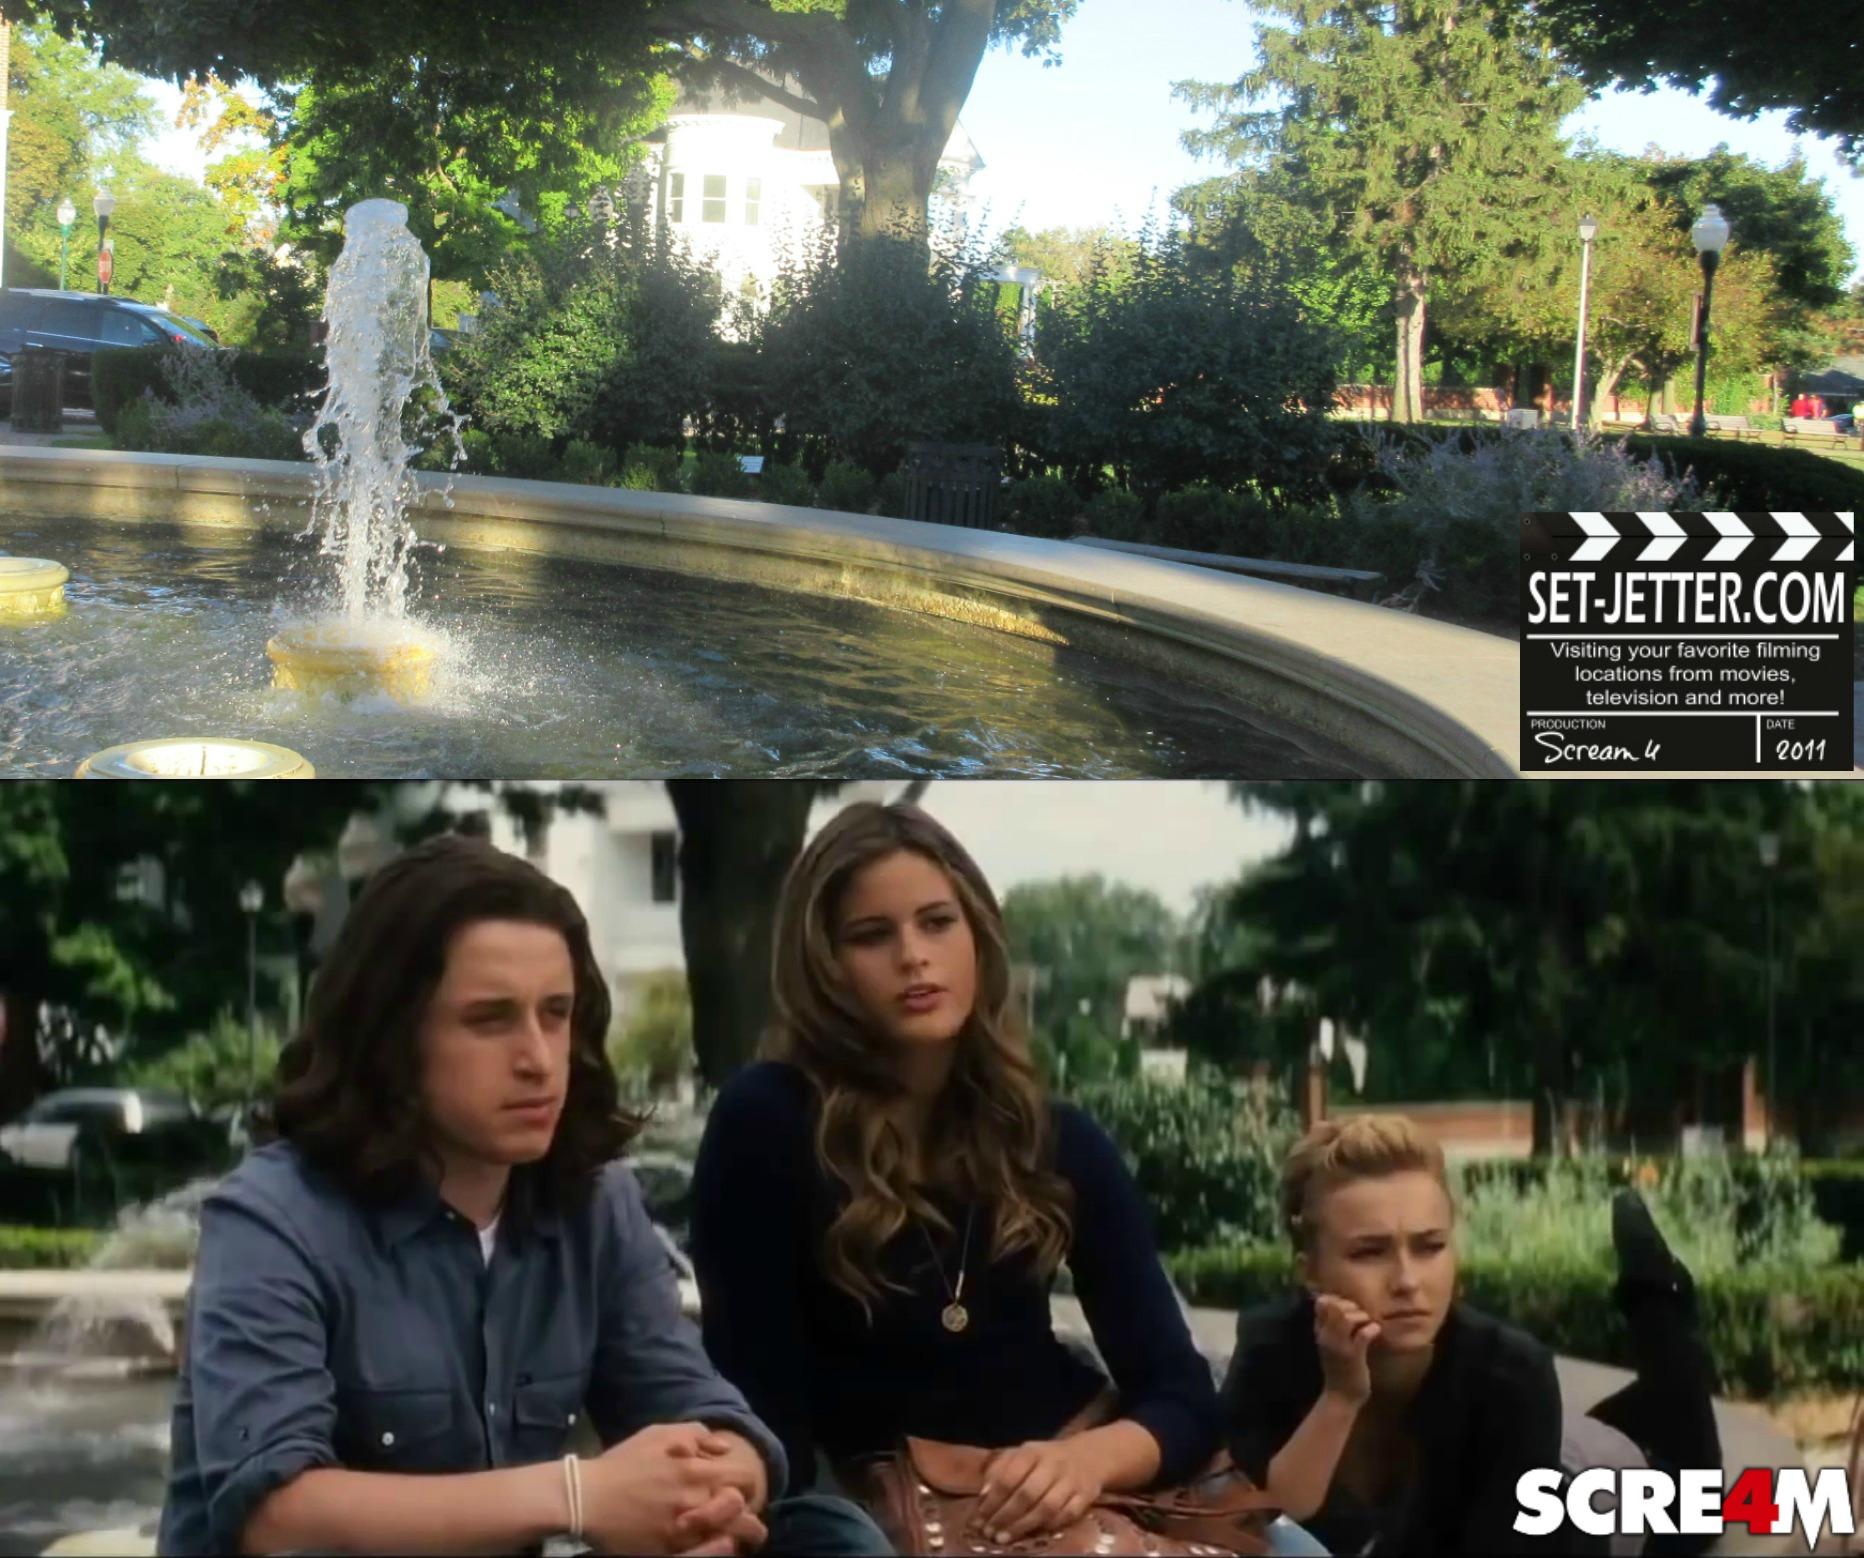 Scream4 comparison 153.jpg